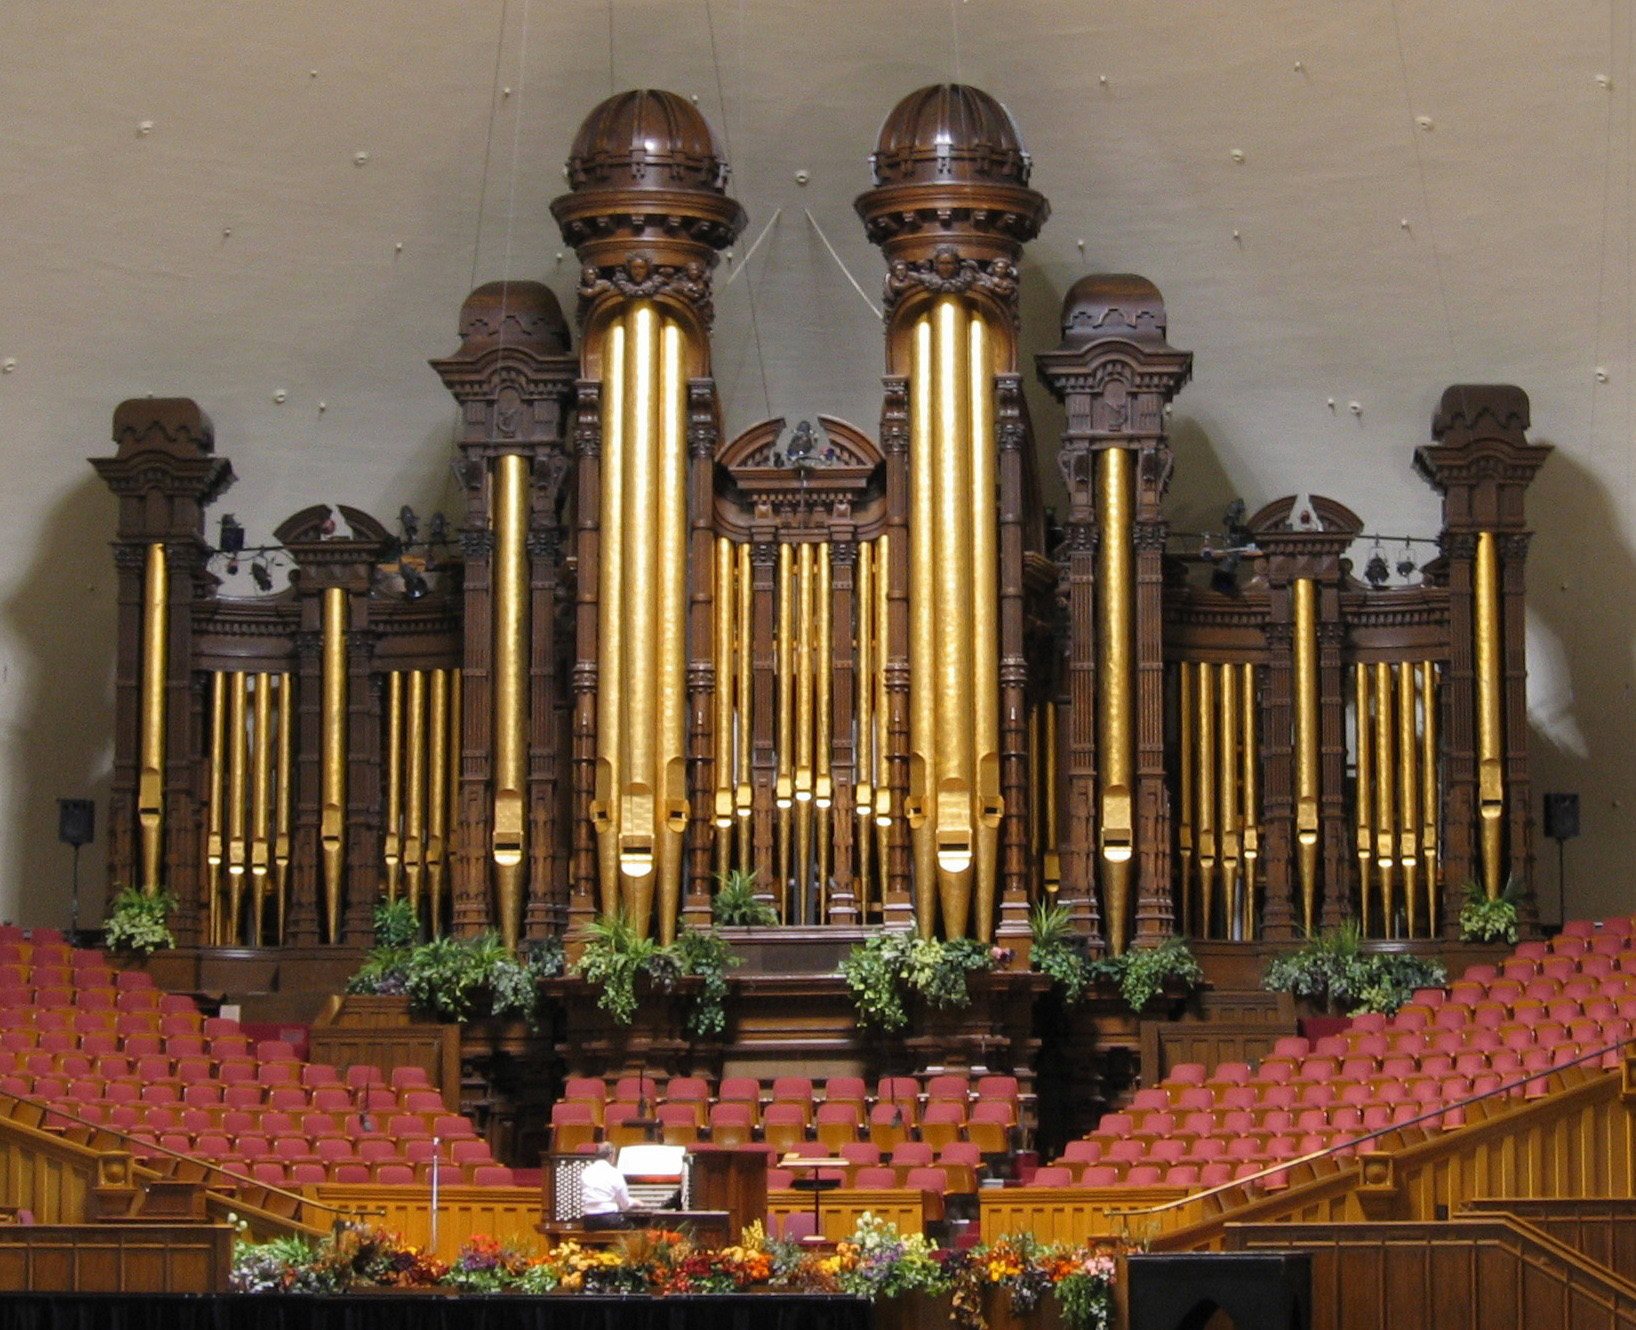 Salt Lake Tabernacle organ - Wikipedia